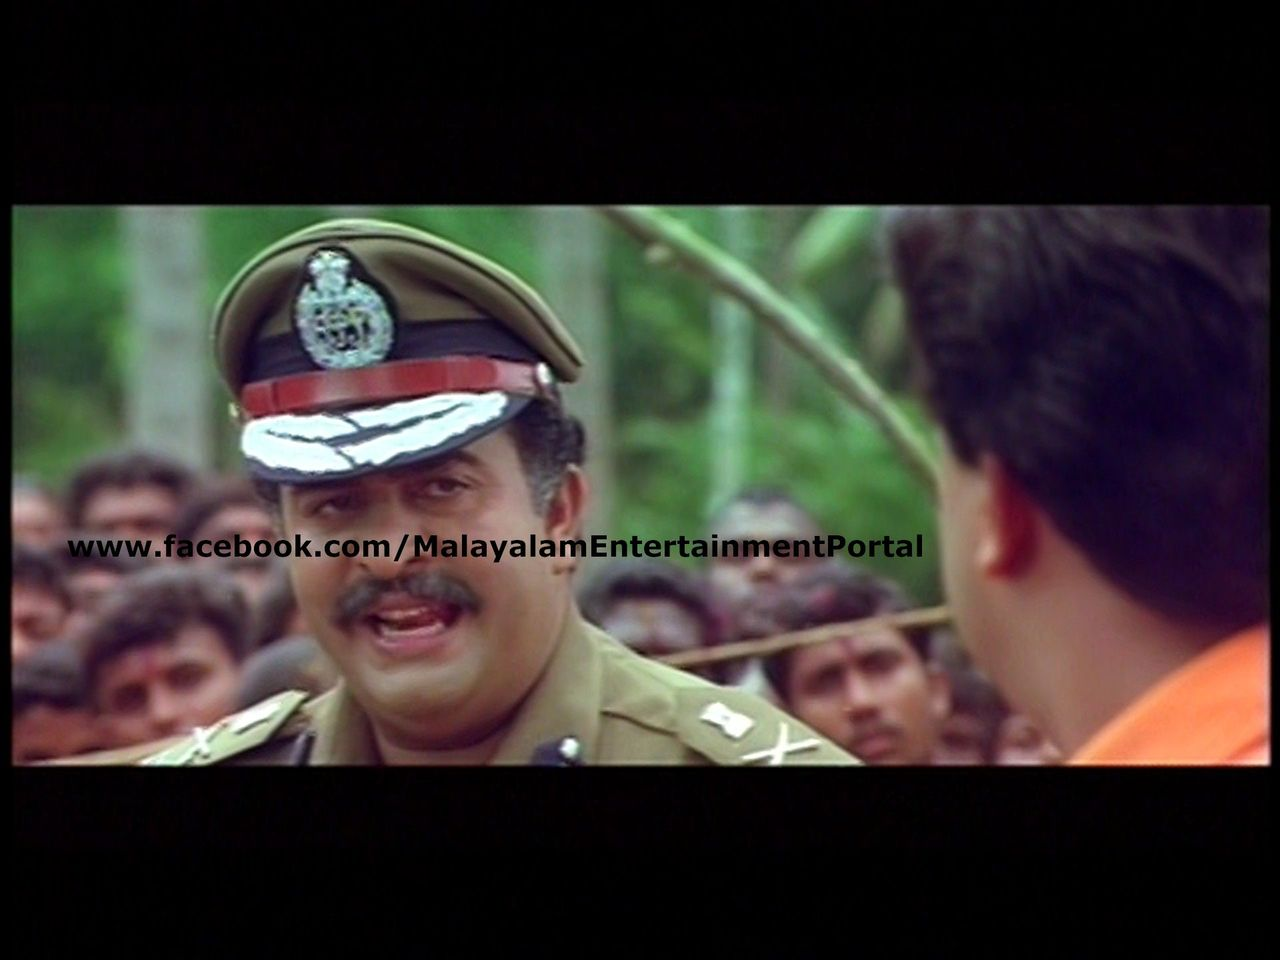 Rakshasarajavu DVD Screenshots (Saina) Bscap0025